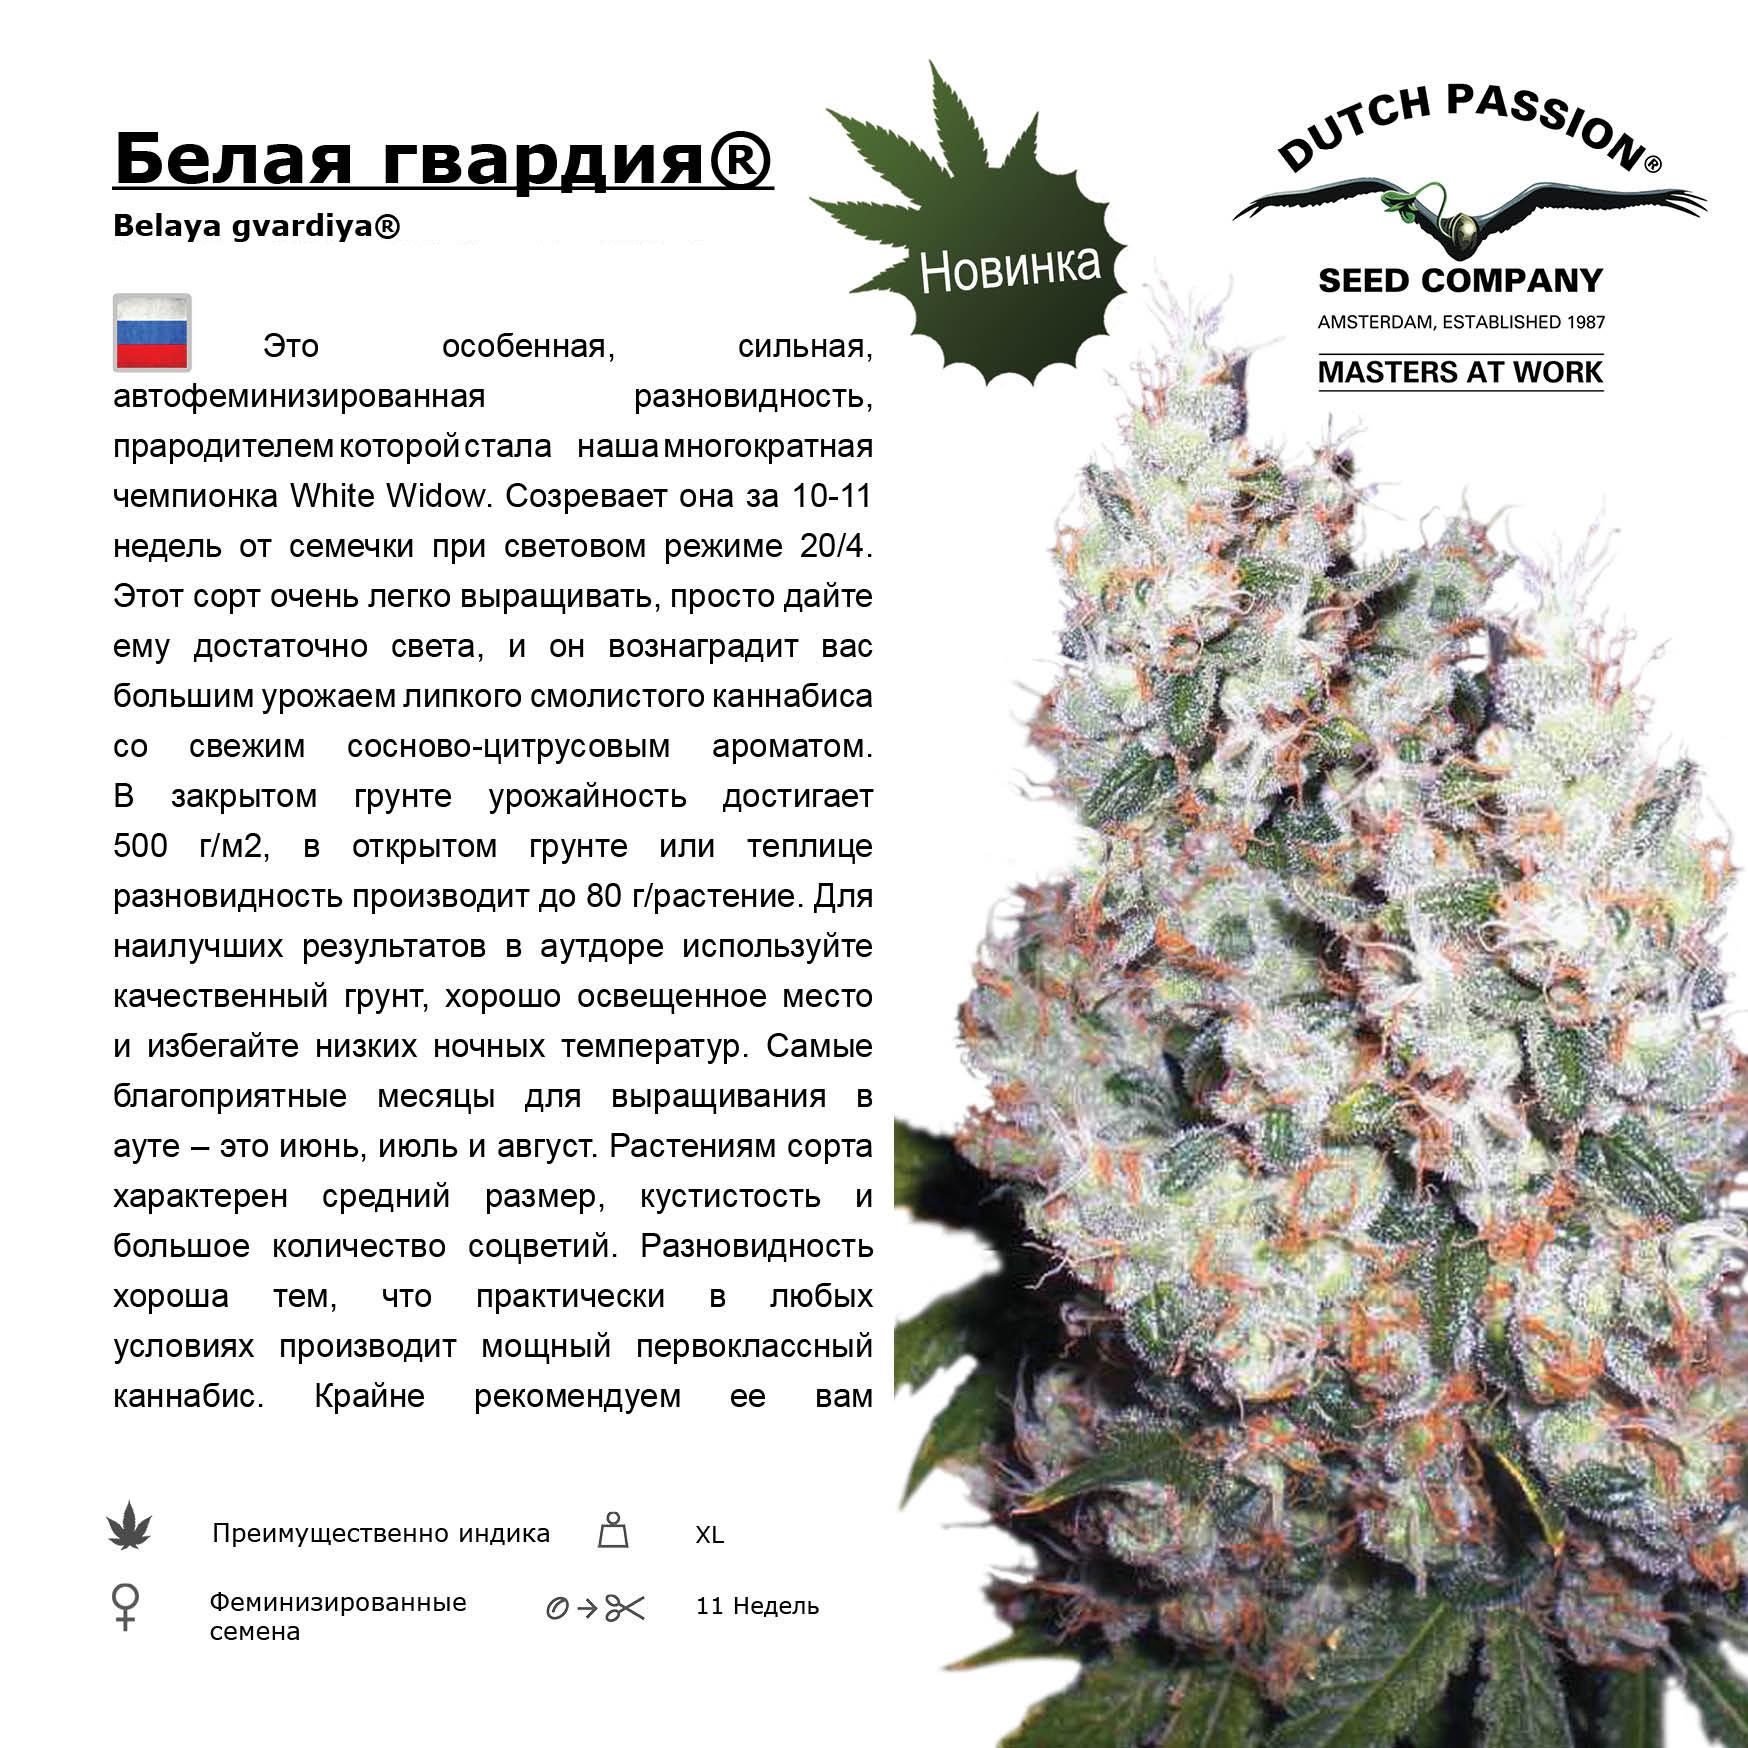 http://www.dutch-passion.nl/img/nieuwsbrief_org/Rus%20Belaya%20gvardiya.jpg